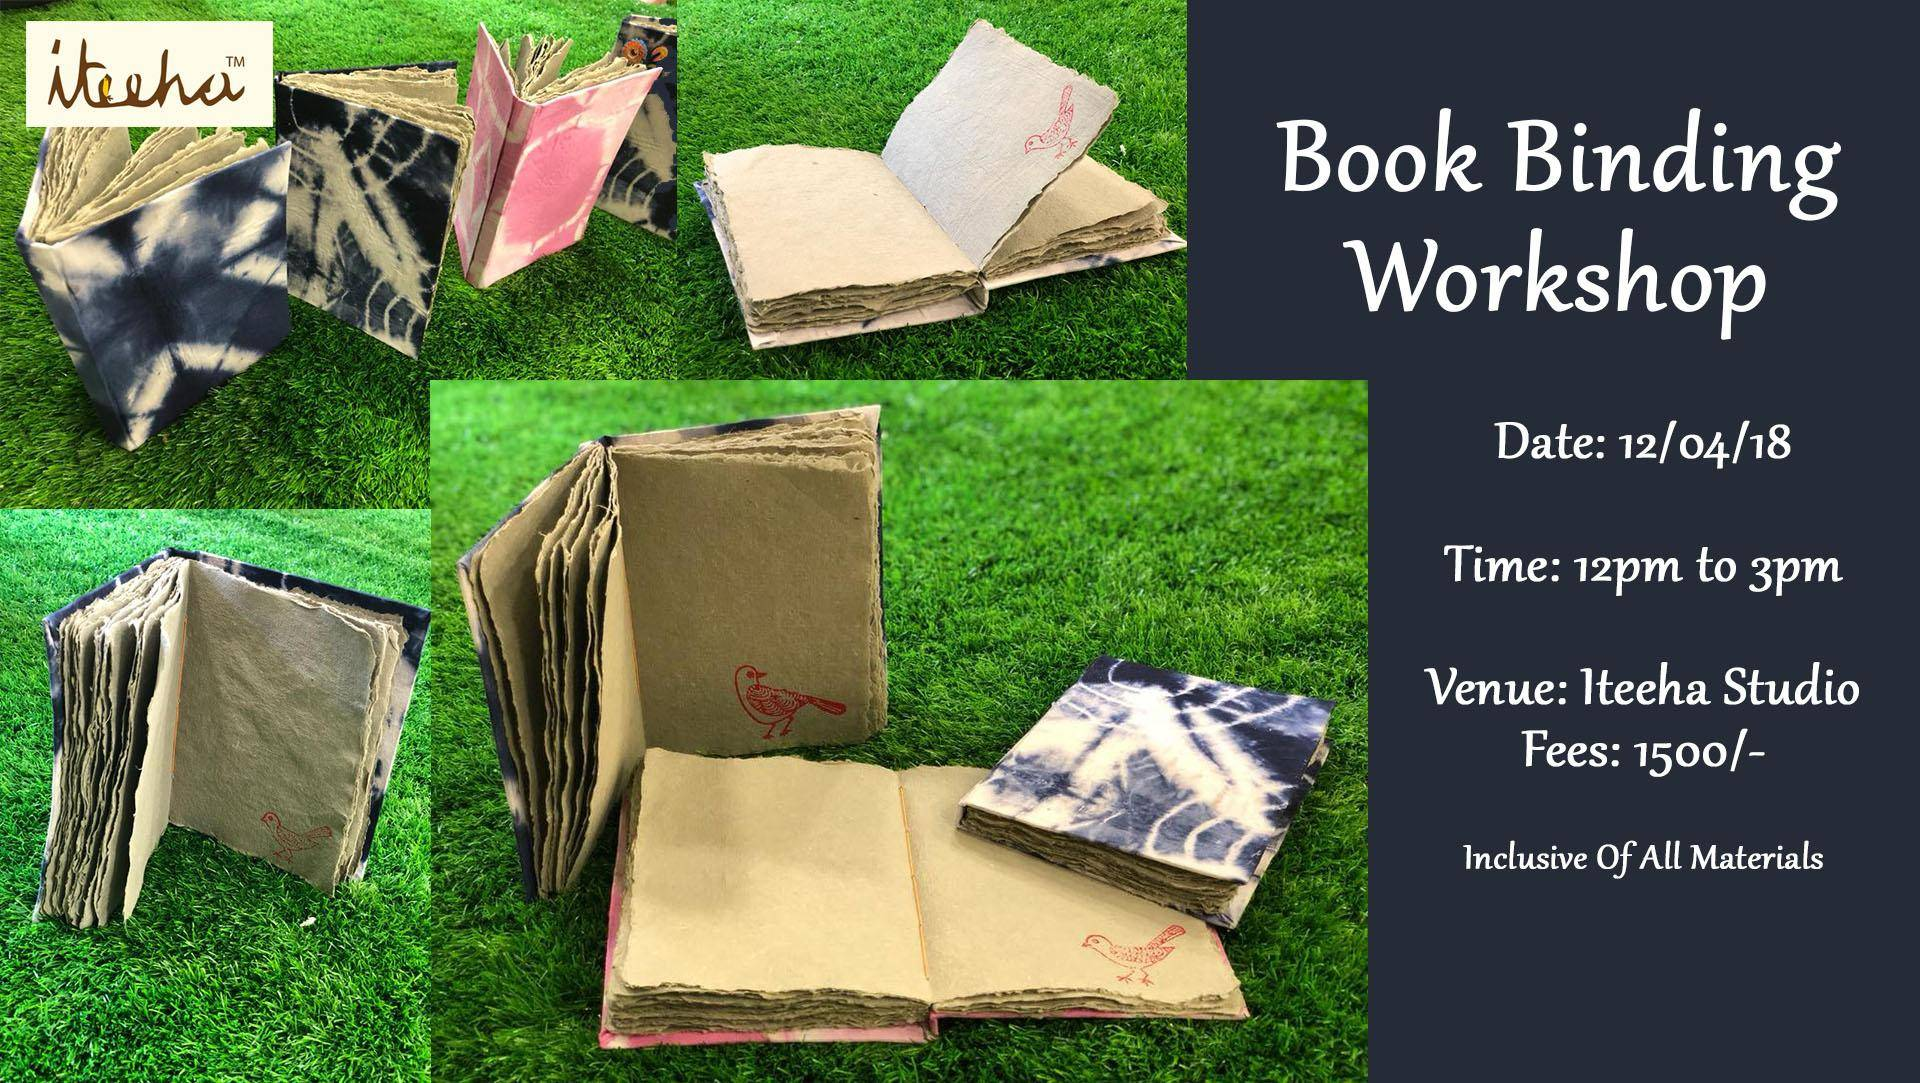 Book Binding Workshop